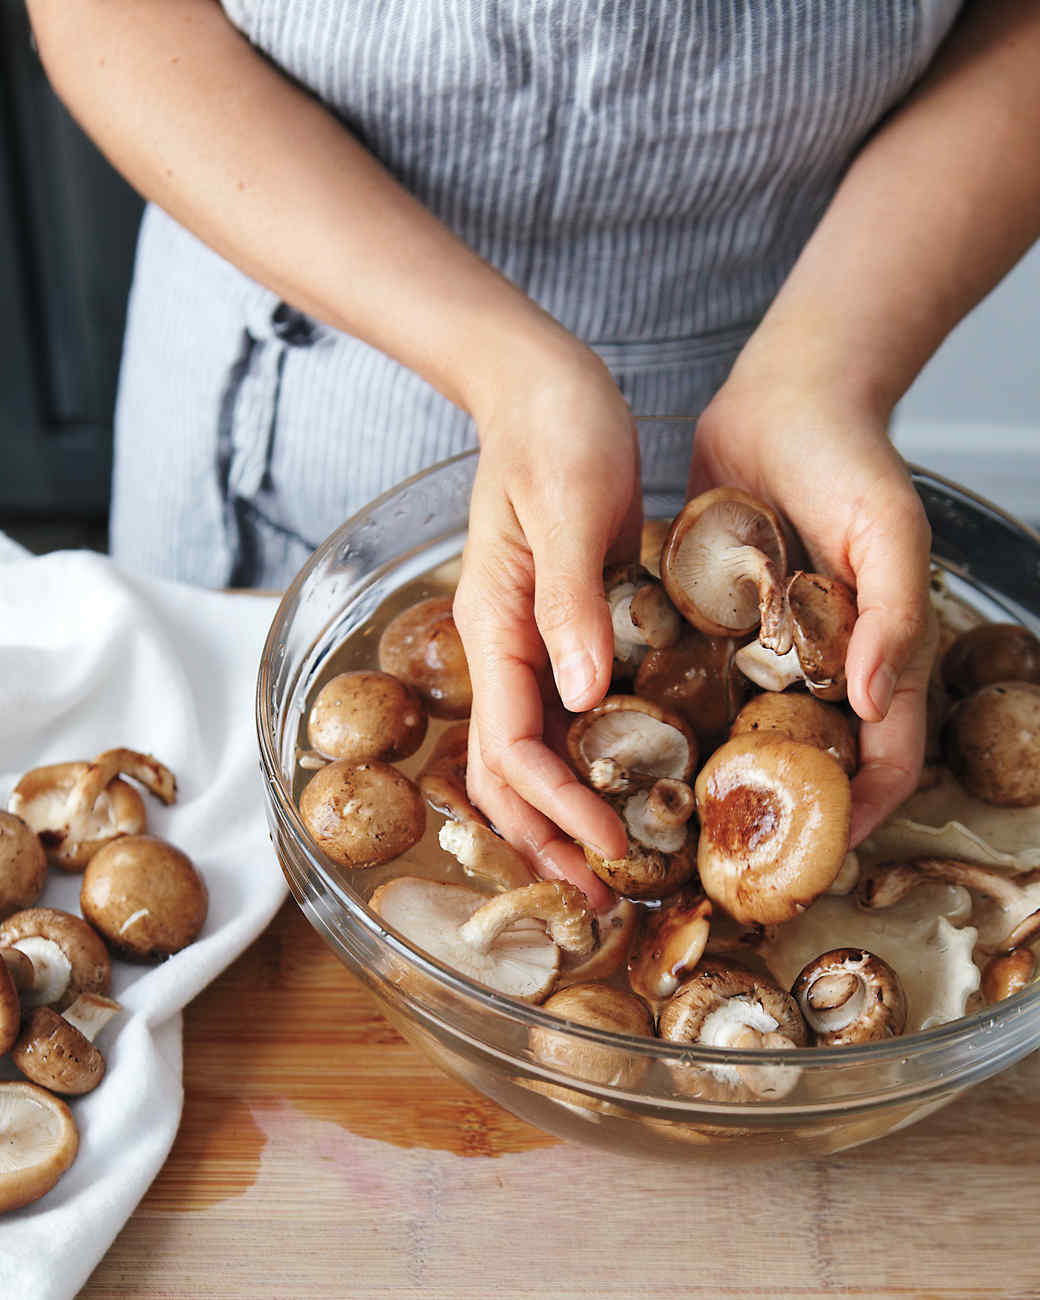 mushroom-ragout-diy-463-md110558.jpg